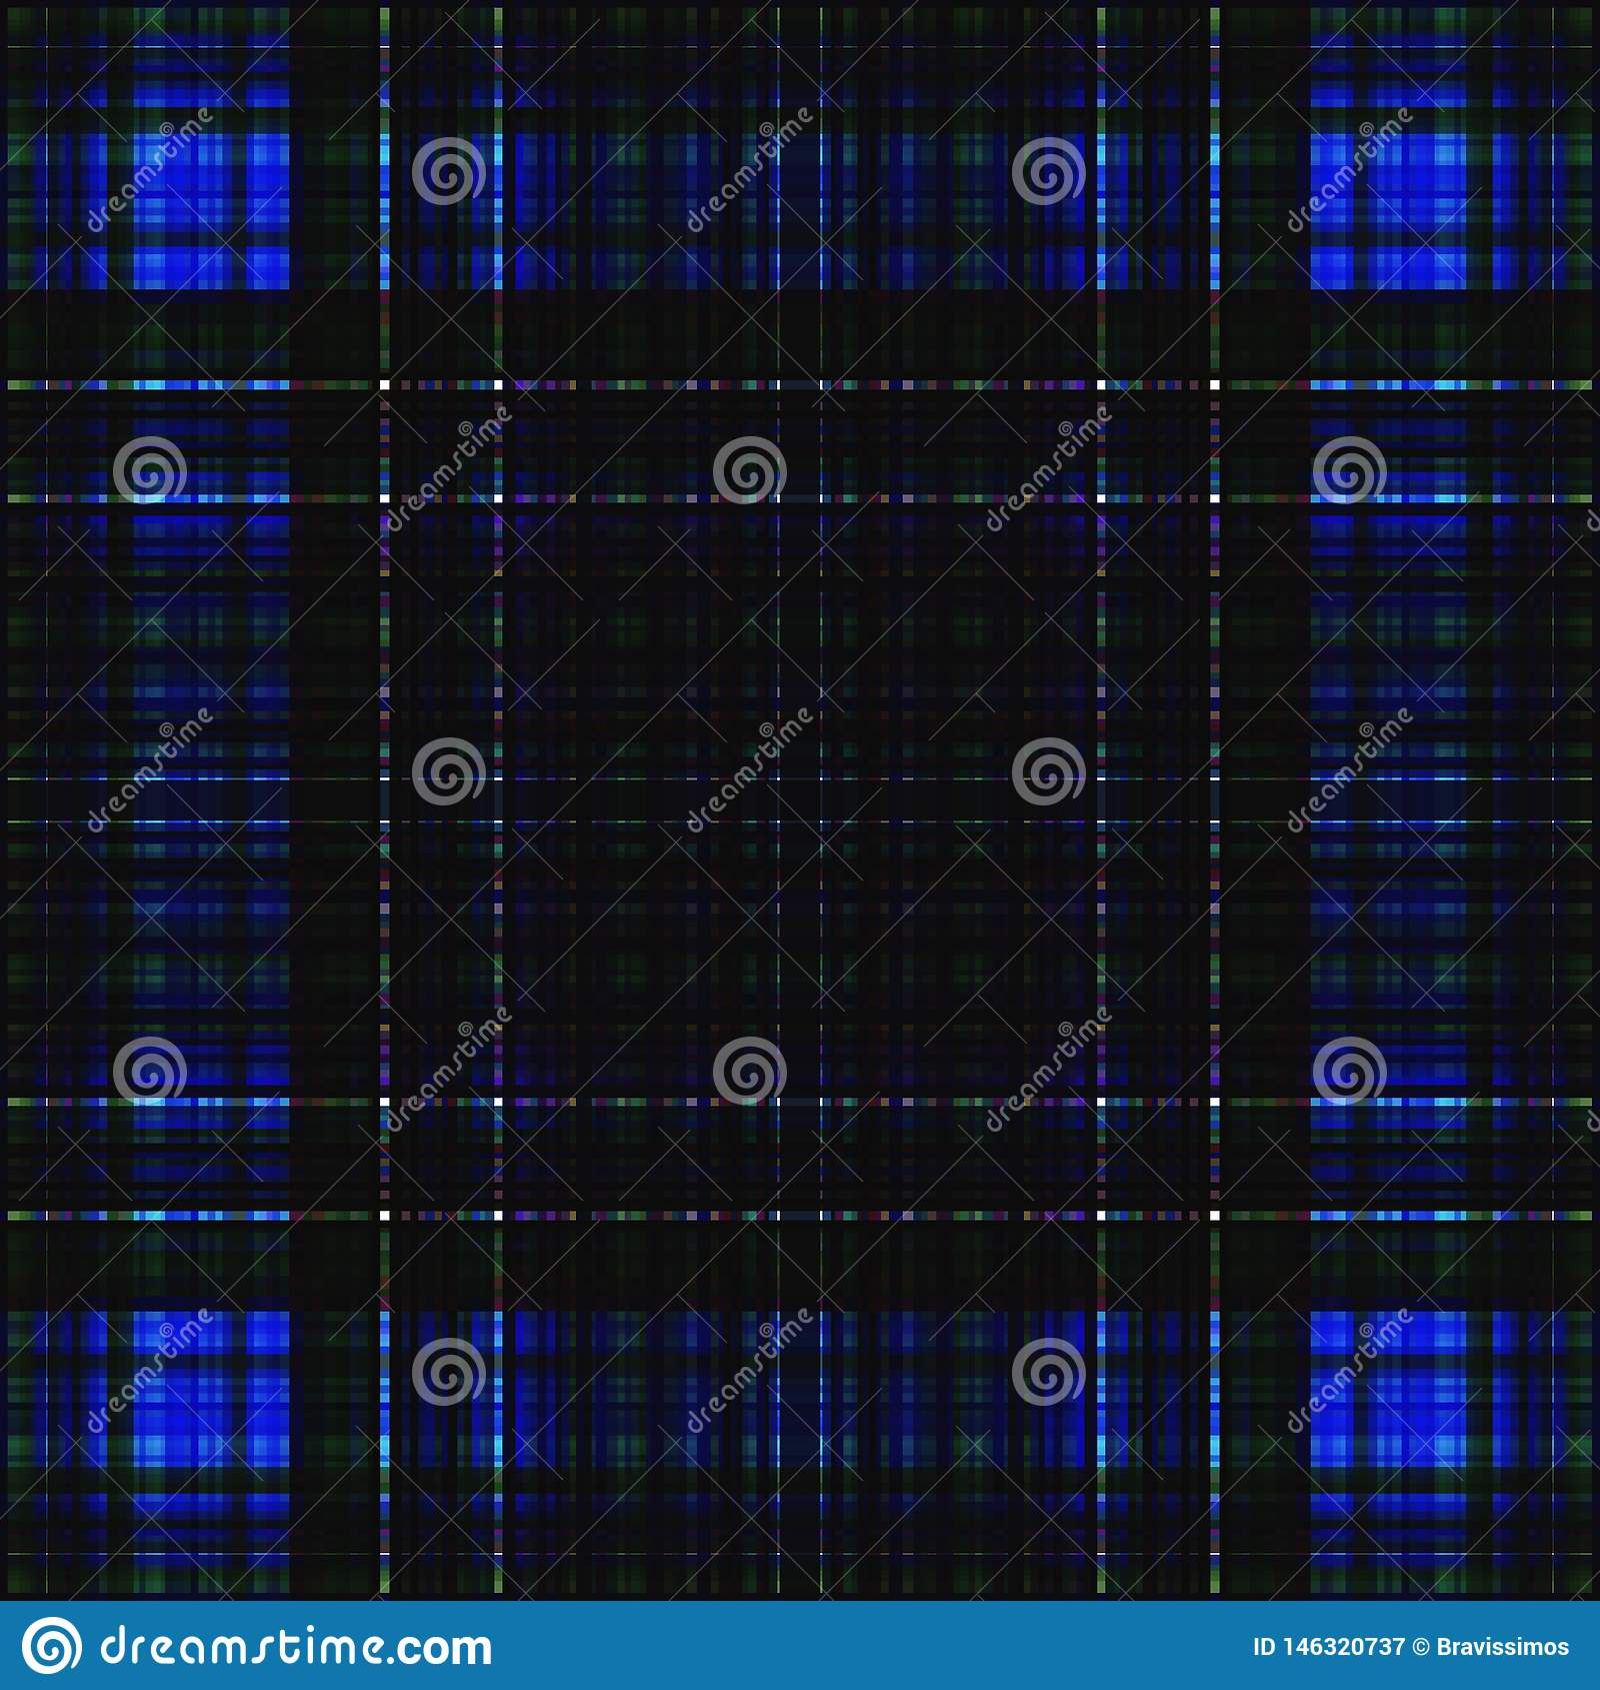 Vierkant hypnotic patroon, geometrische illusie herhaalde tegel